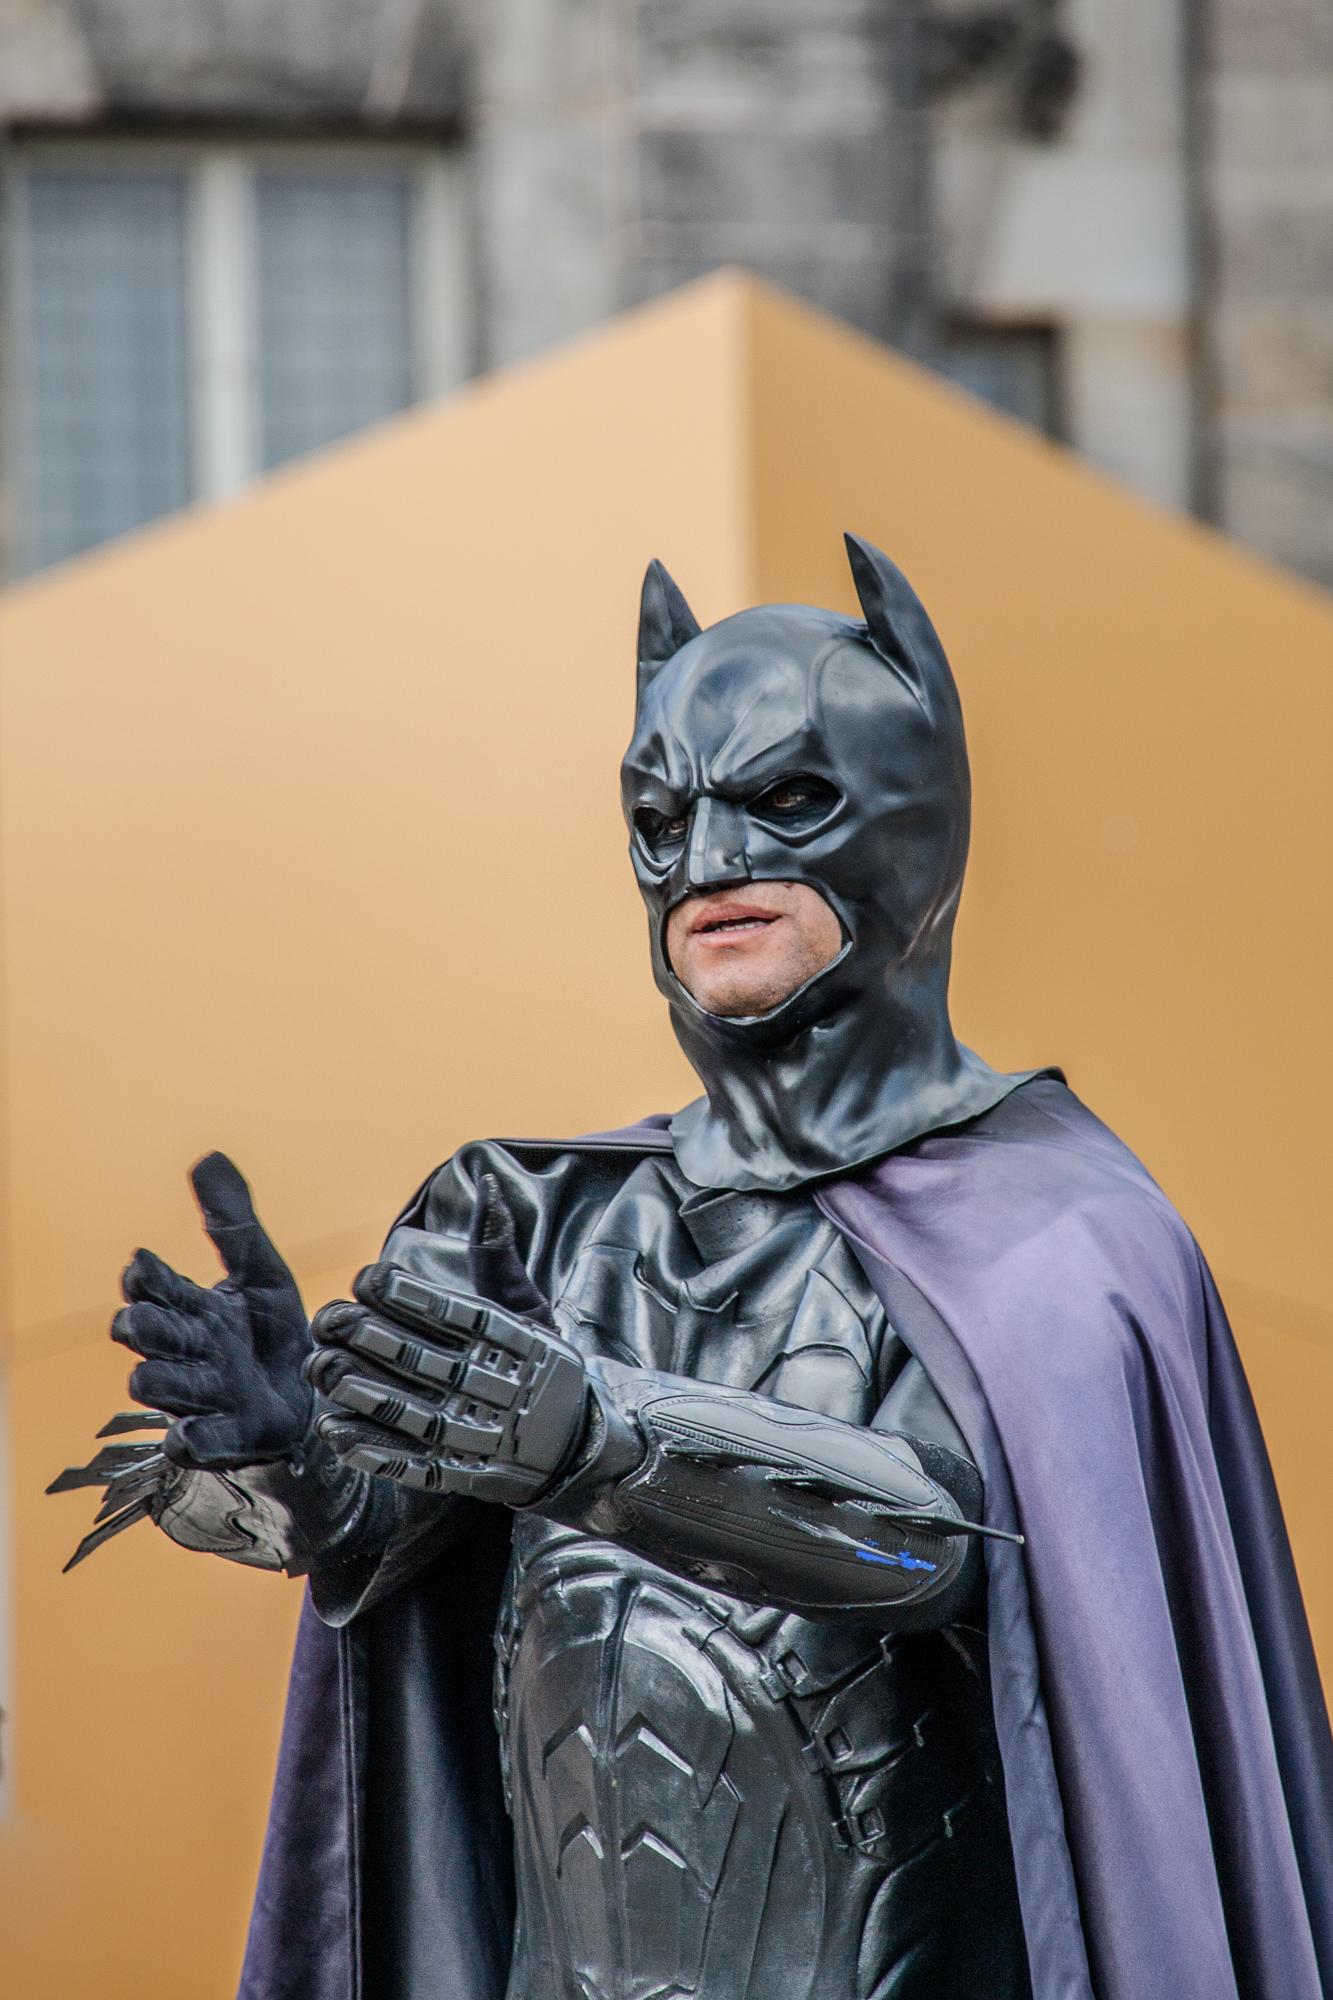 Sensenmann, Batman und Co.